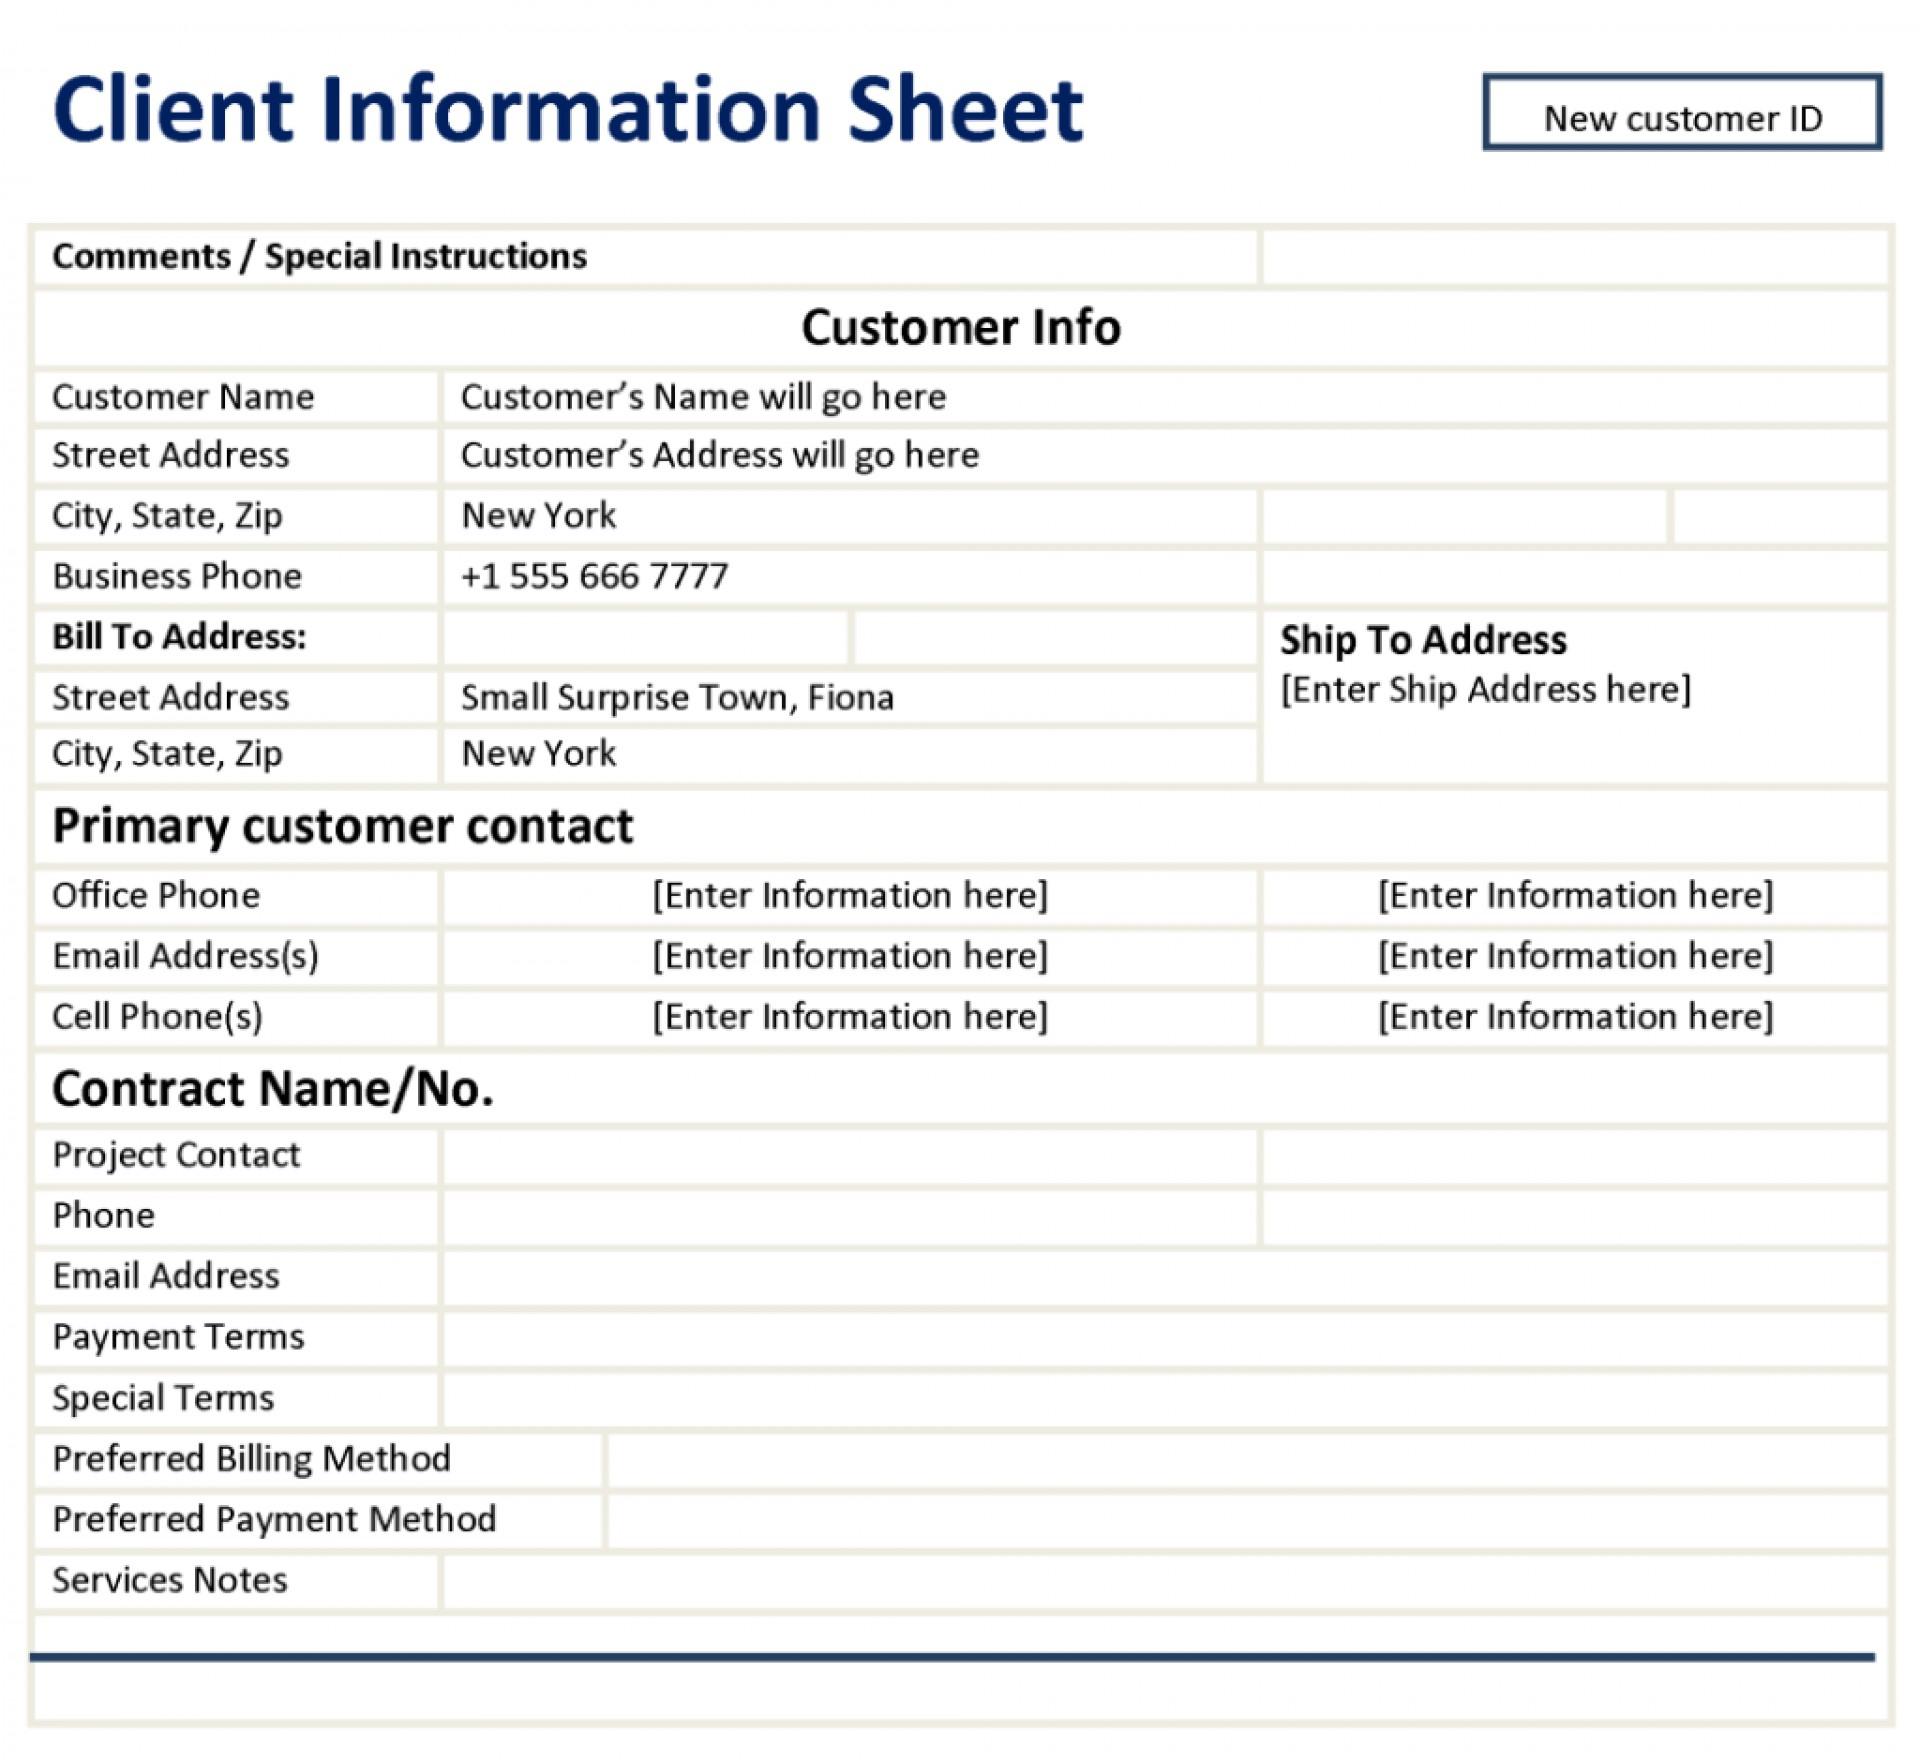 Formidable Patient Information Sheet Template ~ Ulyssesroom - Free Printable Customer Information Sheets